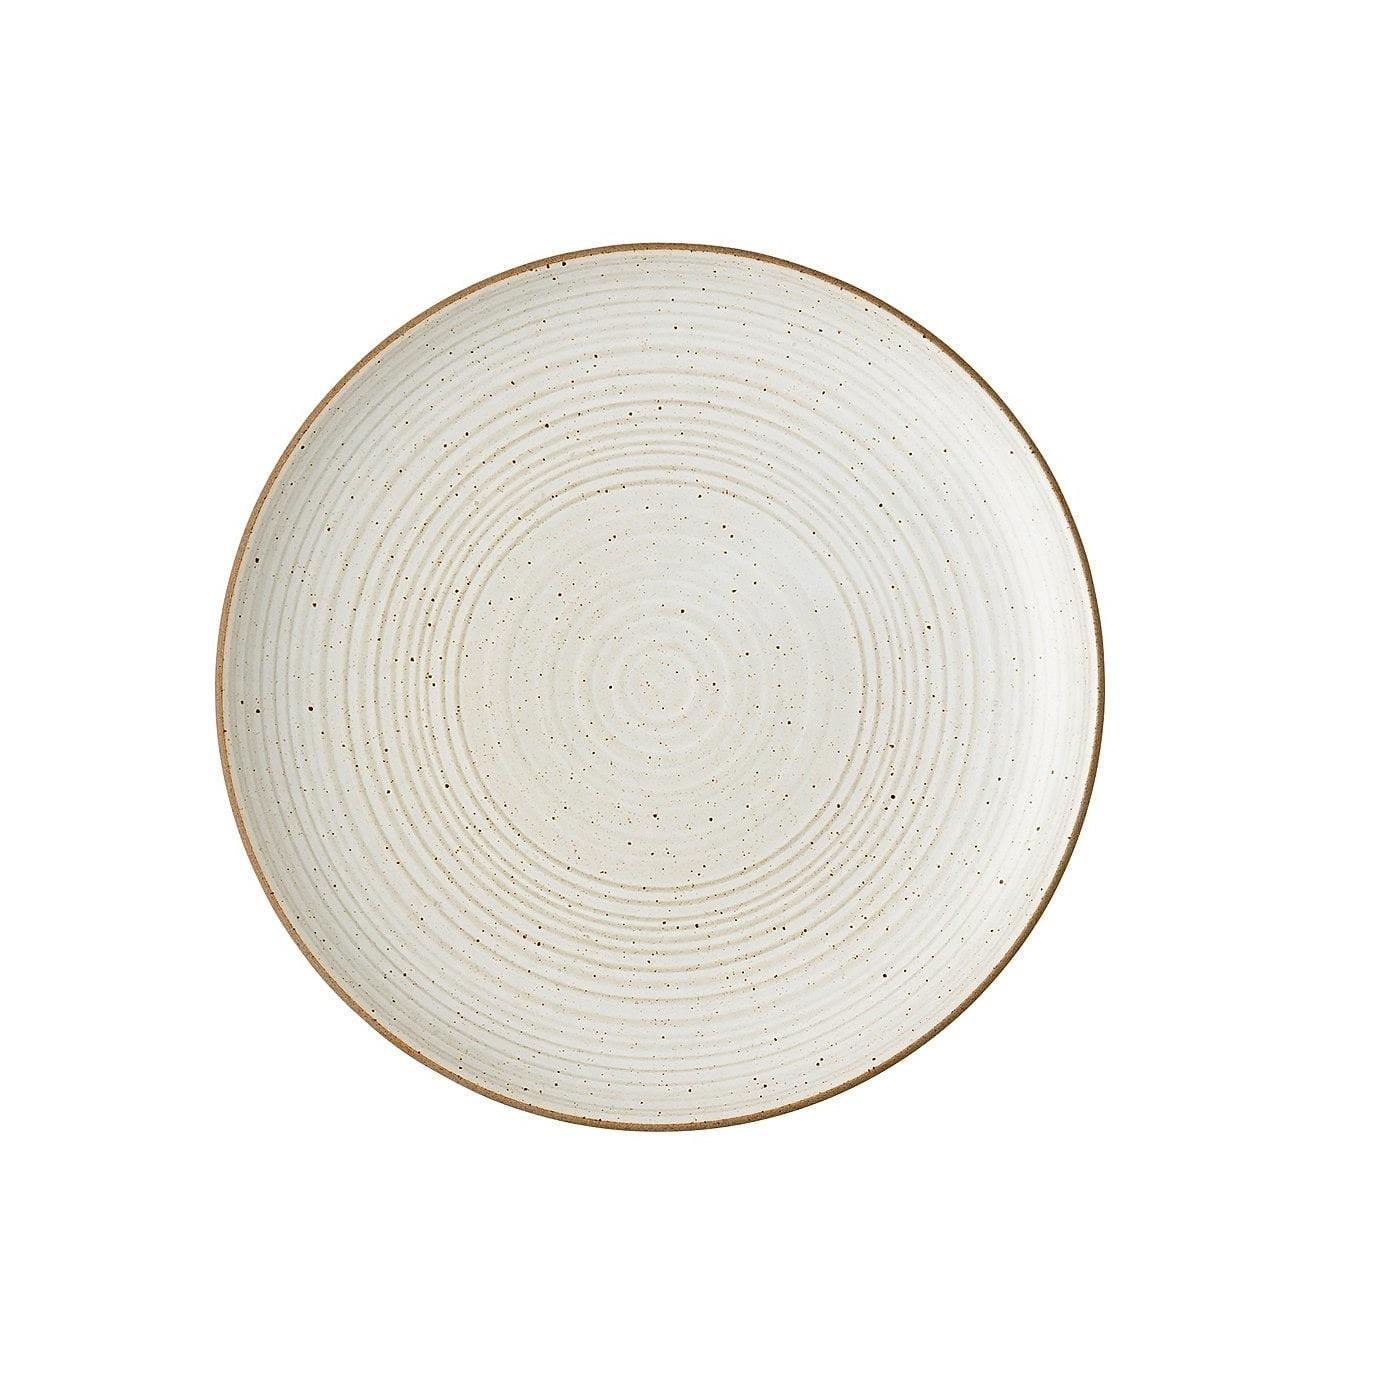 Онлайн каталог PROMENU: Тарелка для завтрака керамическая Thomas Nature, диаметр 22 см, белый                               21730-227070-60222